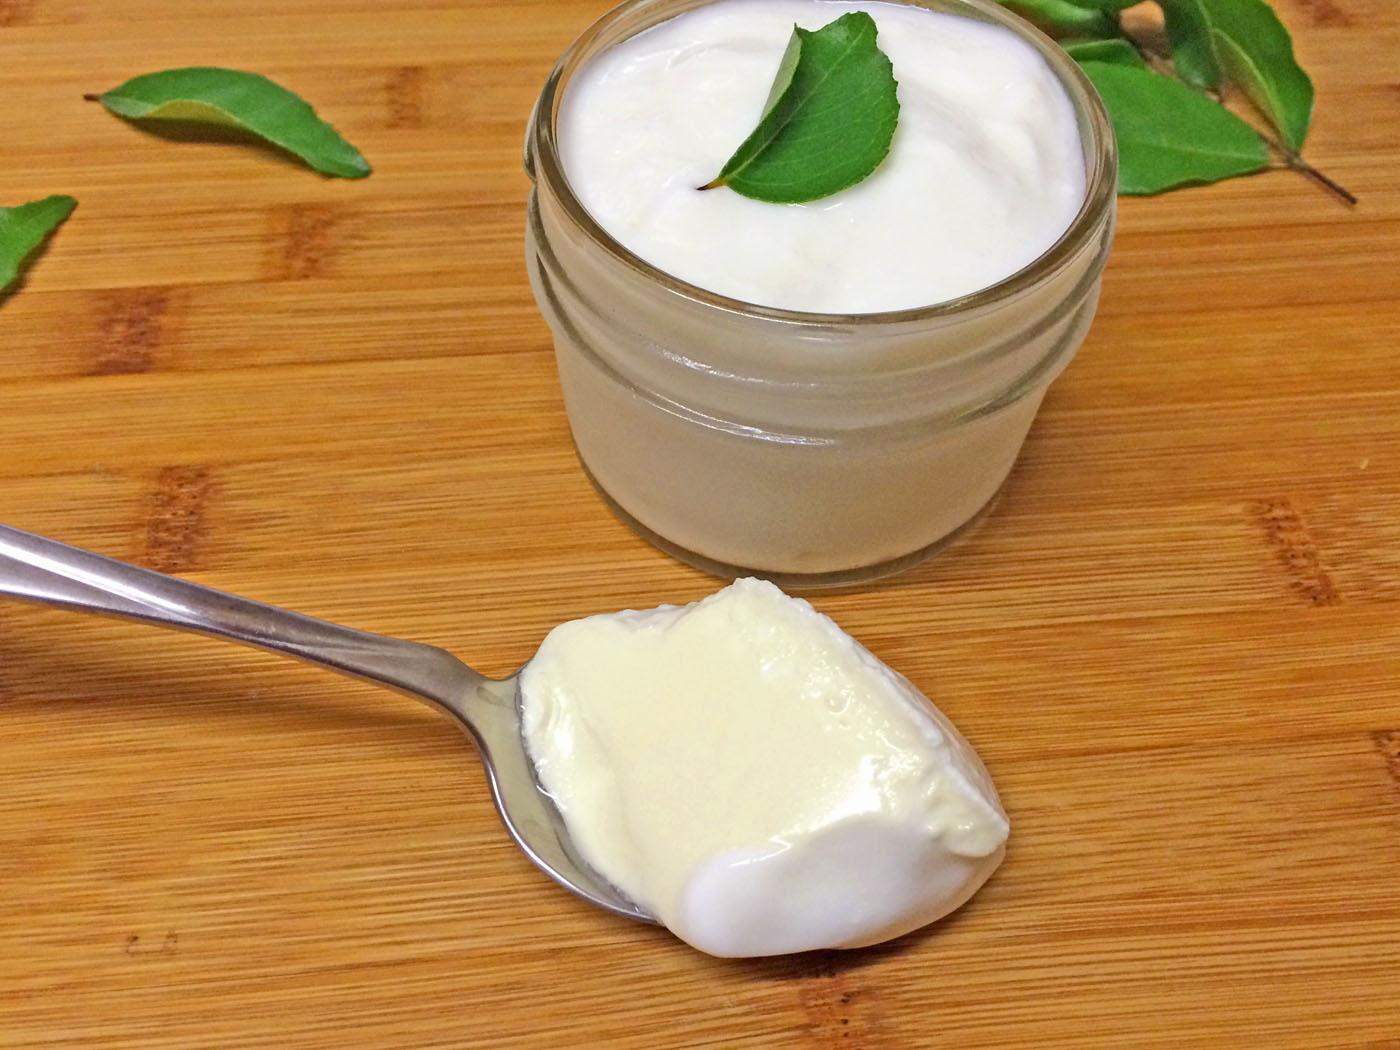 MIND Diet- Sharpen the brain with brain food recipes, Homemade yogurt